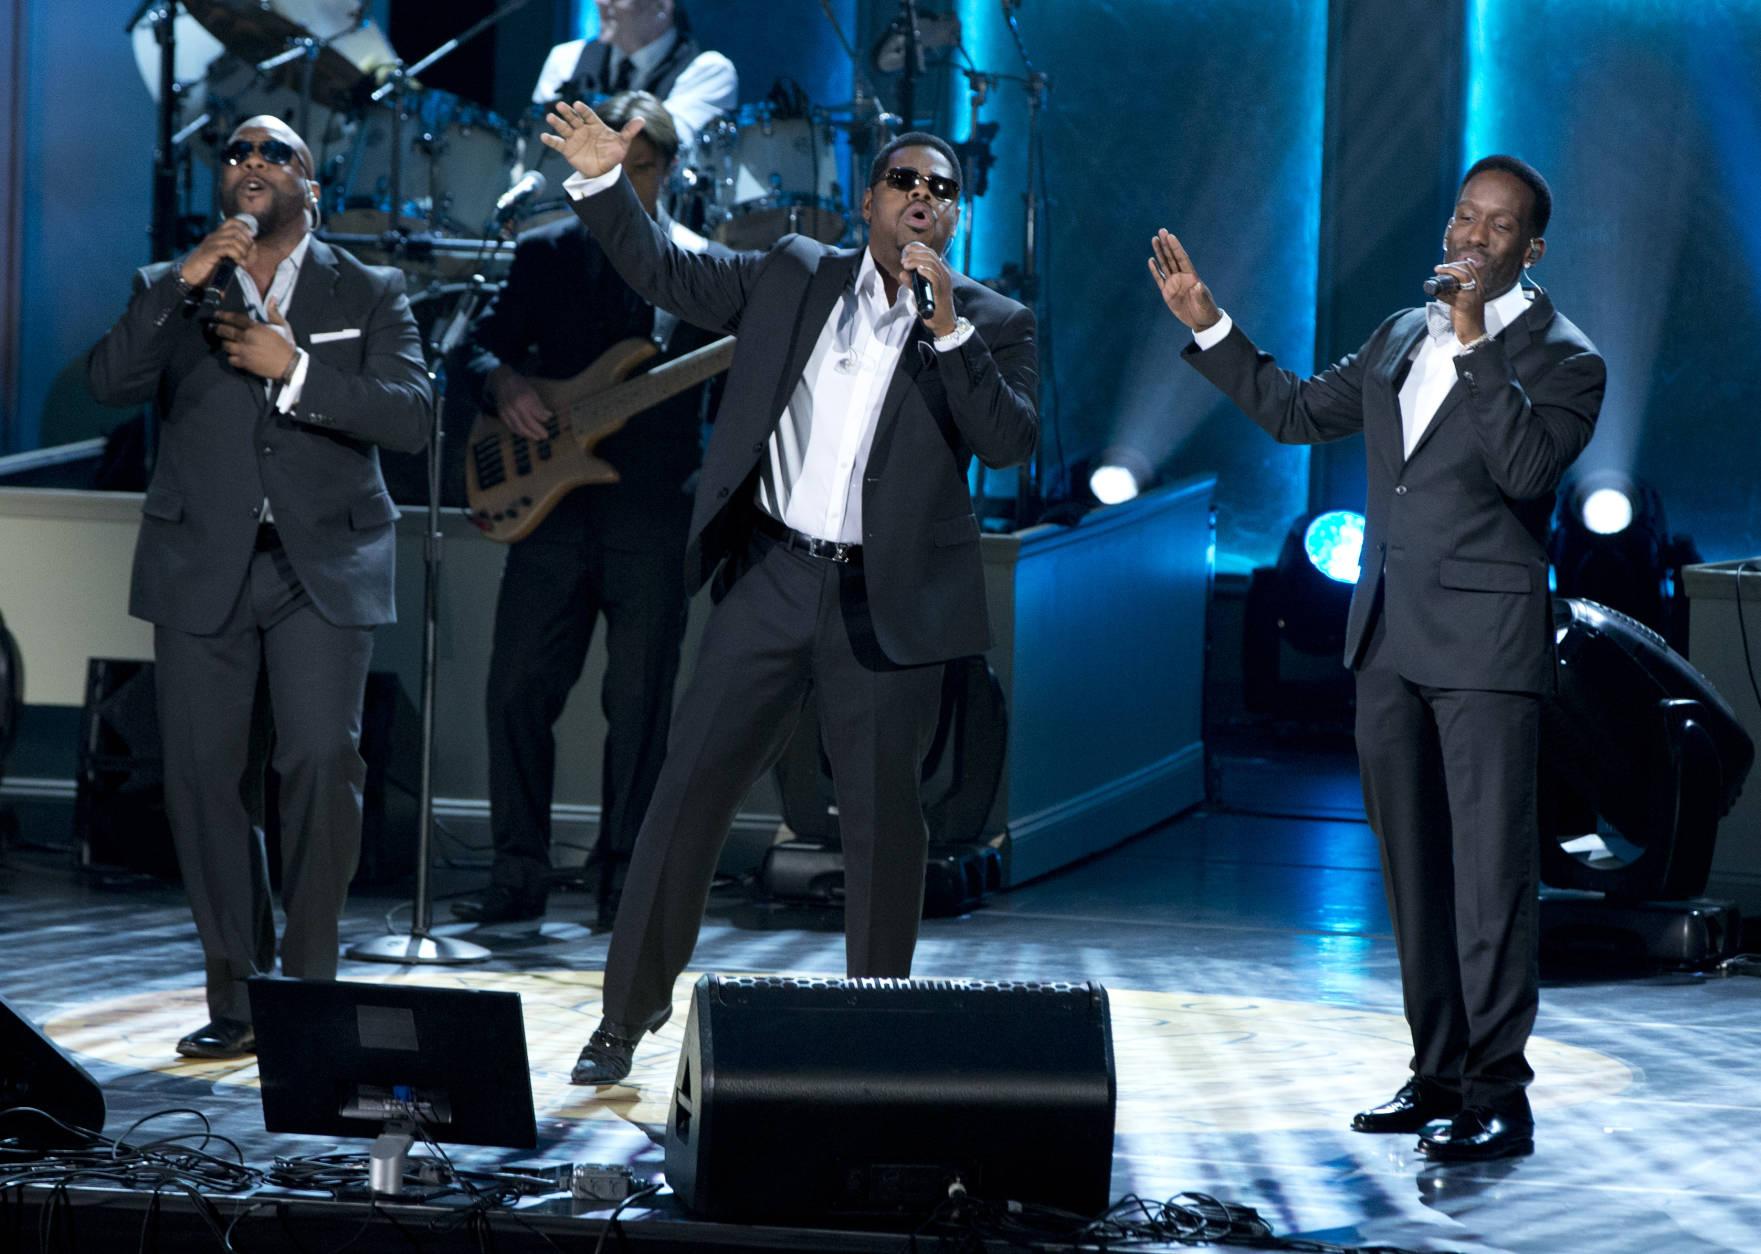 Boyz II Men will perform at MGM National Harbor on Dec. 15, 2016. (AP Photo/Carolyn Kaster)